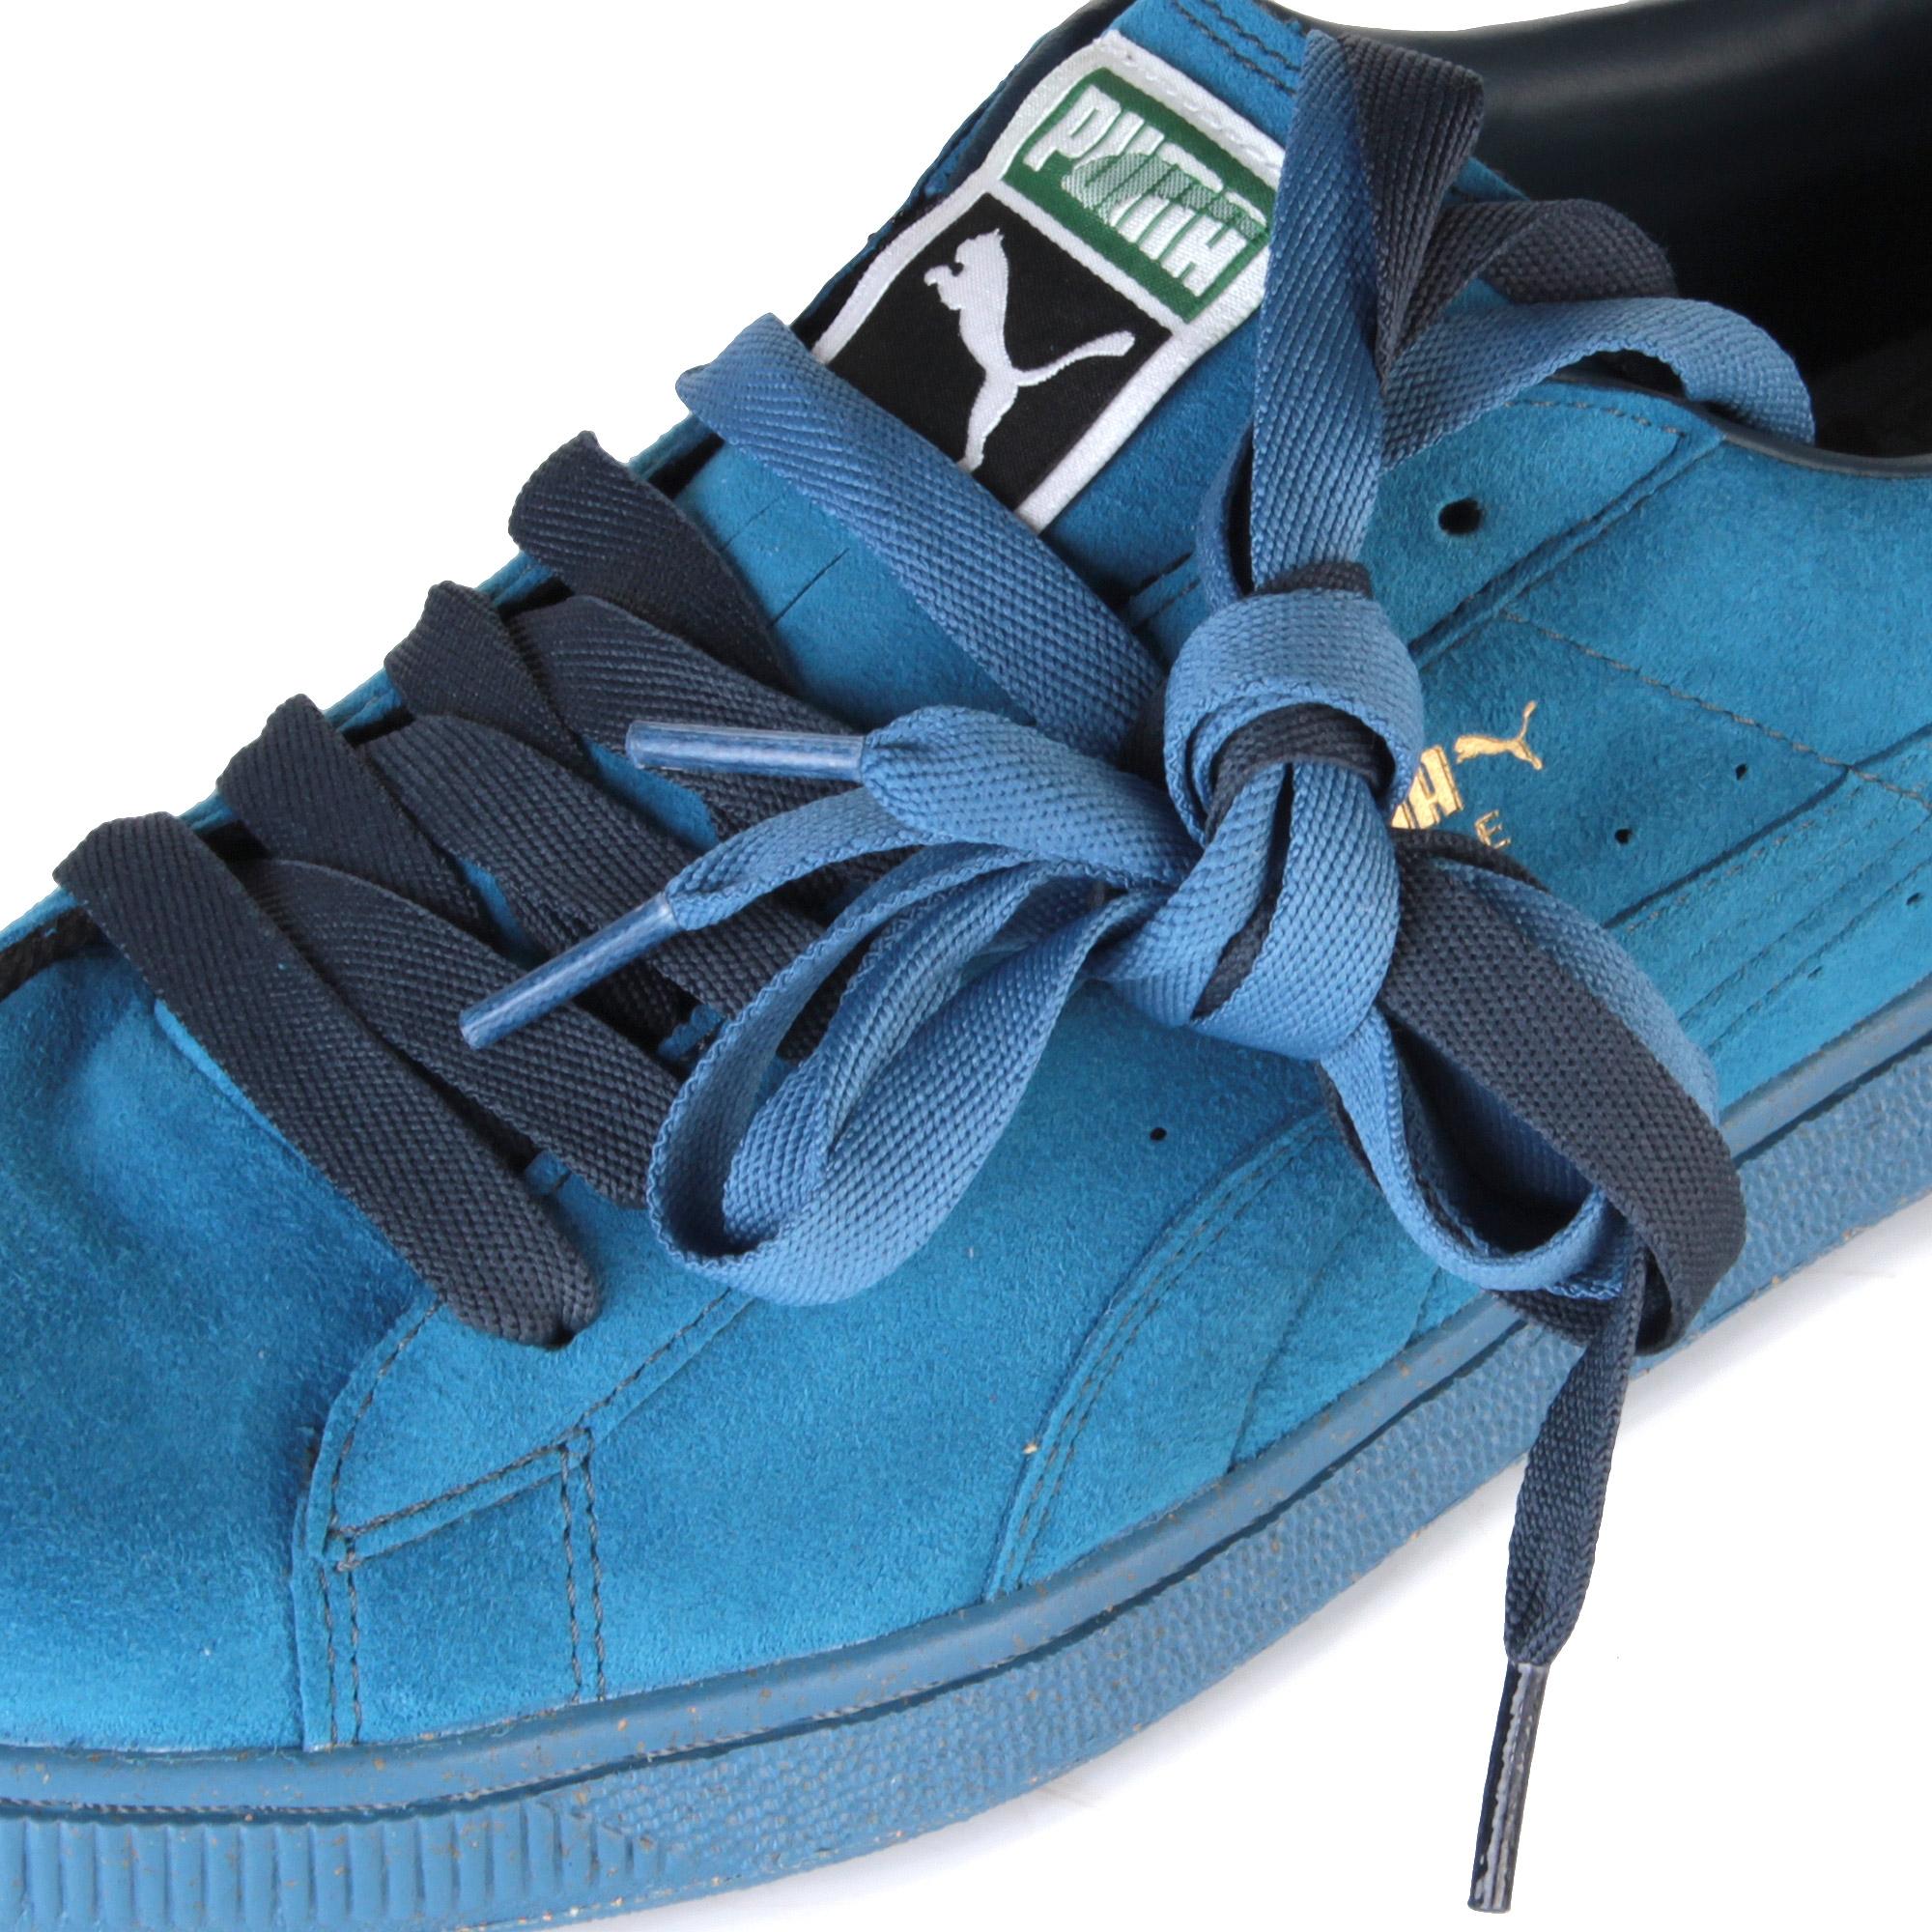 408d3906f29 Puma Re-Suede vallarta blue midnight navy